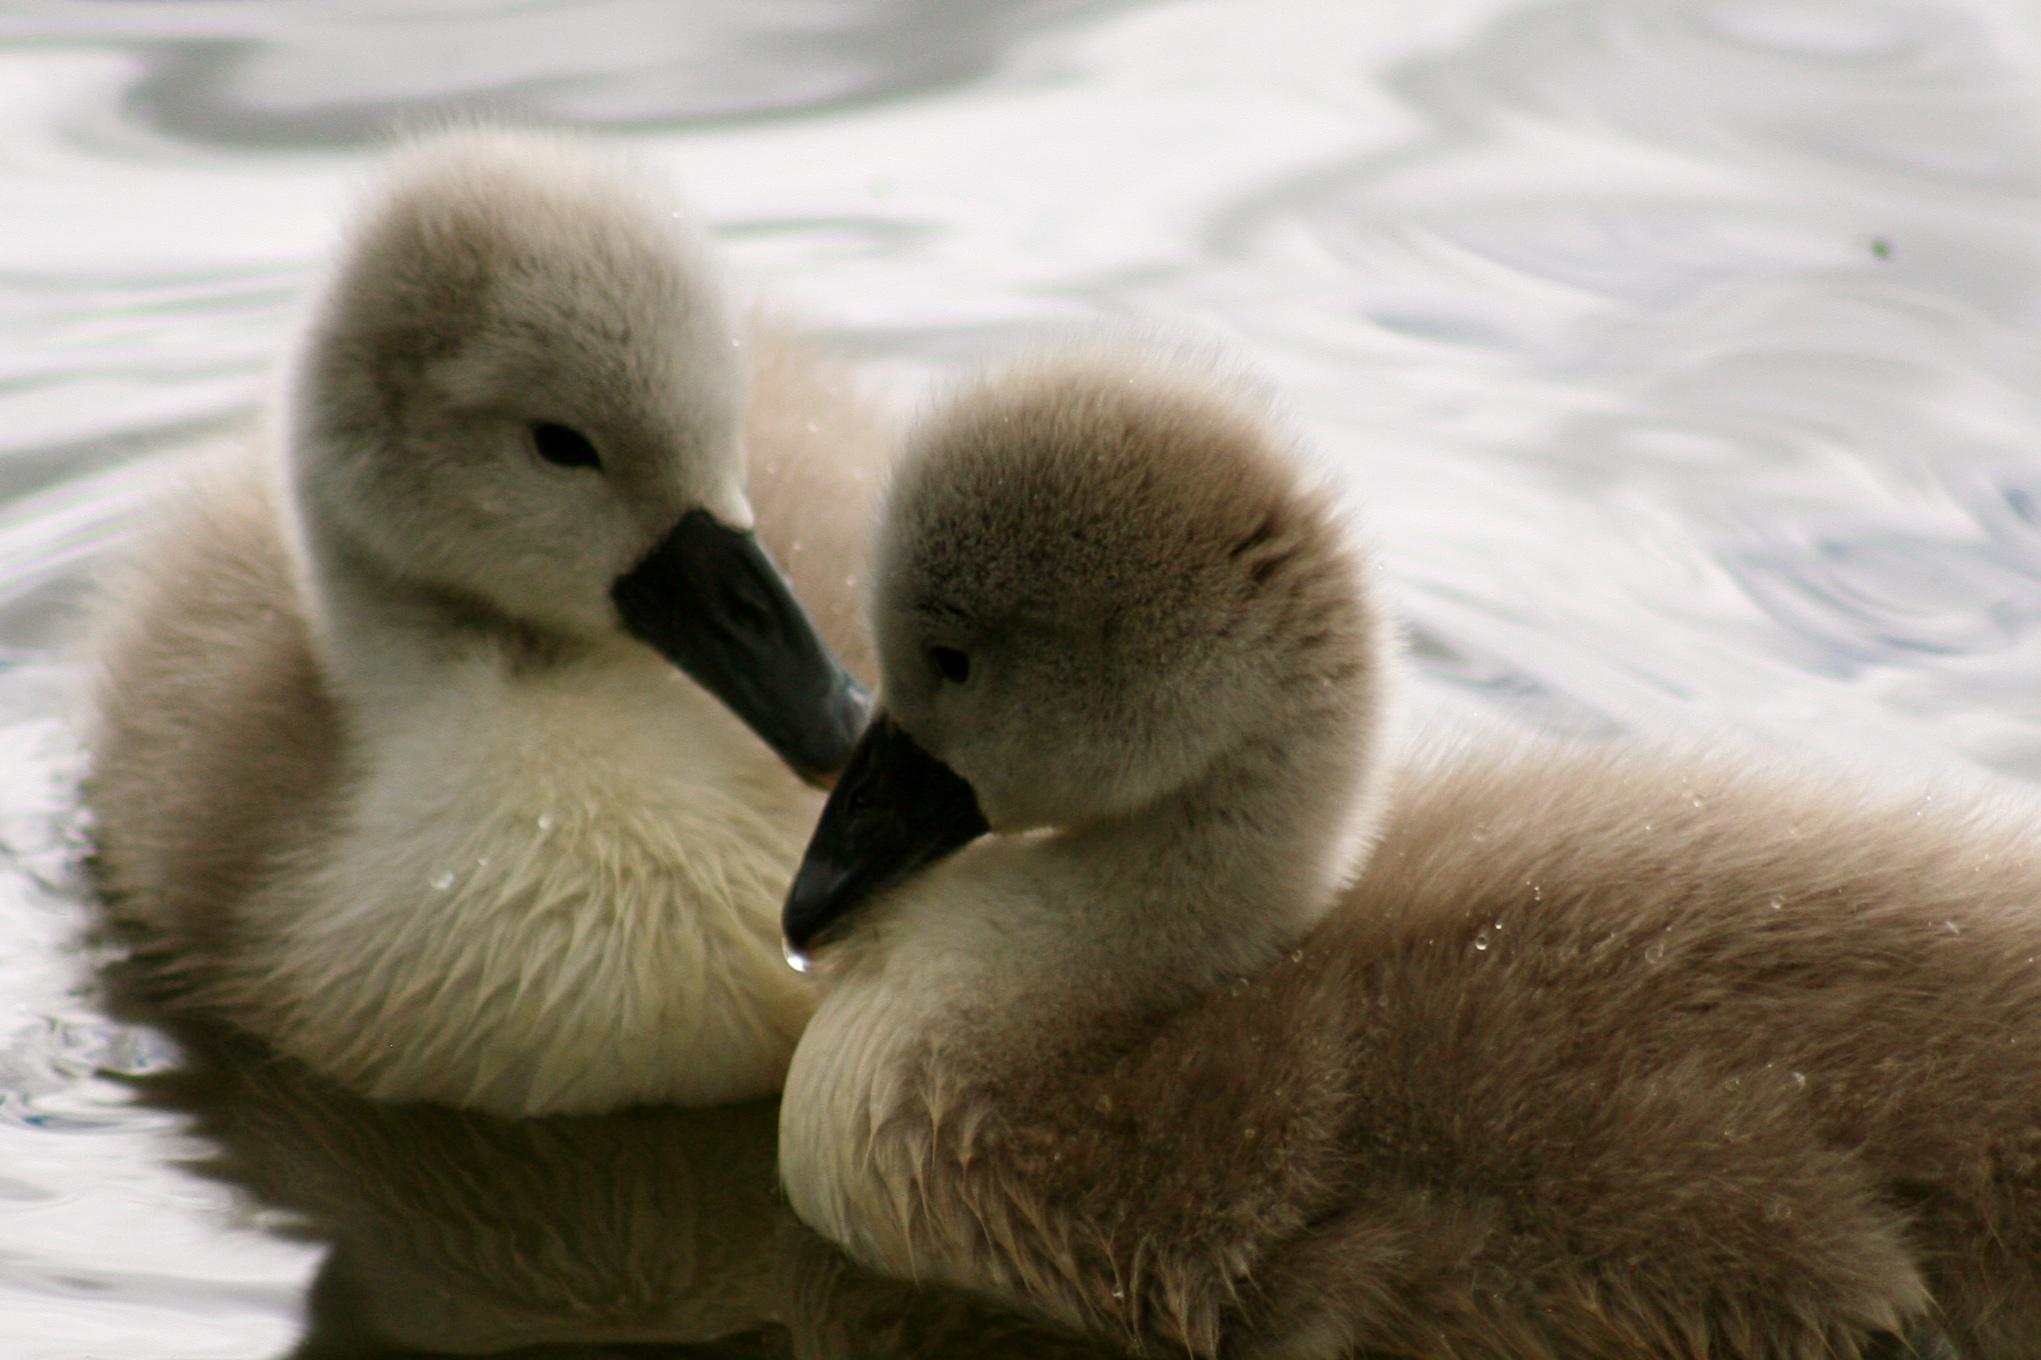 File:Photojenni - baby swan (by).jpg - Wikimedia Commons